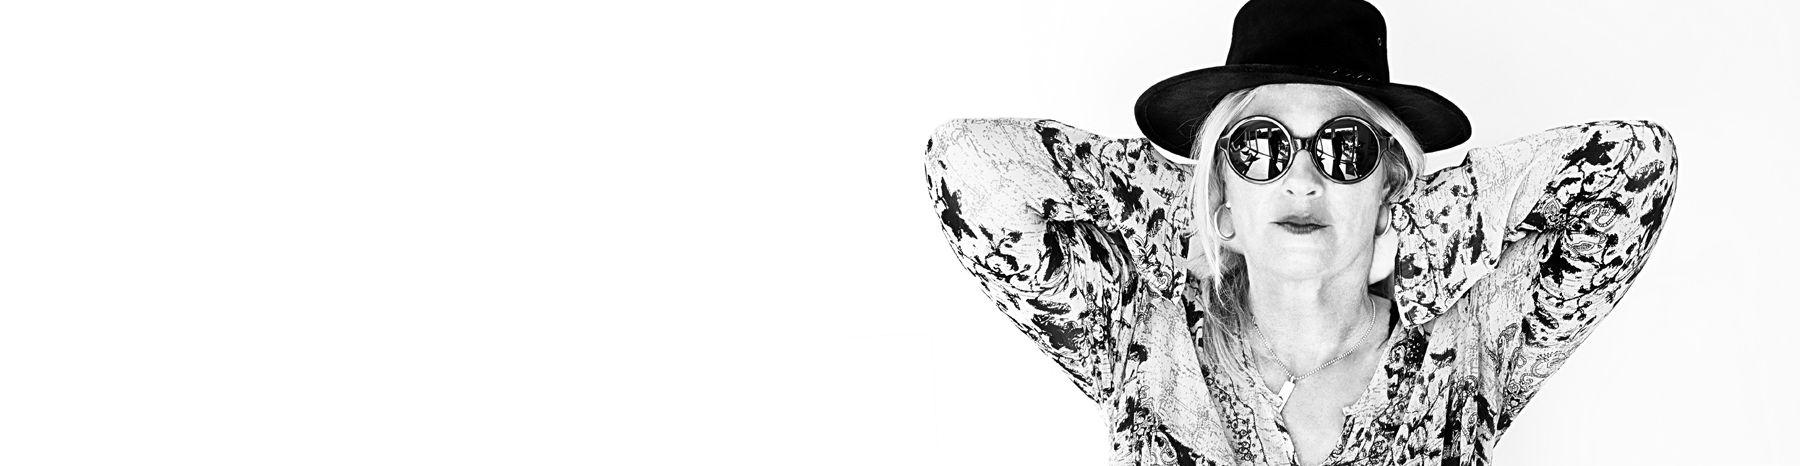 New album 2014: Raw